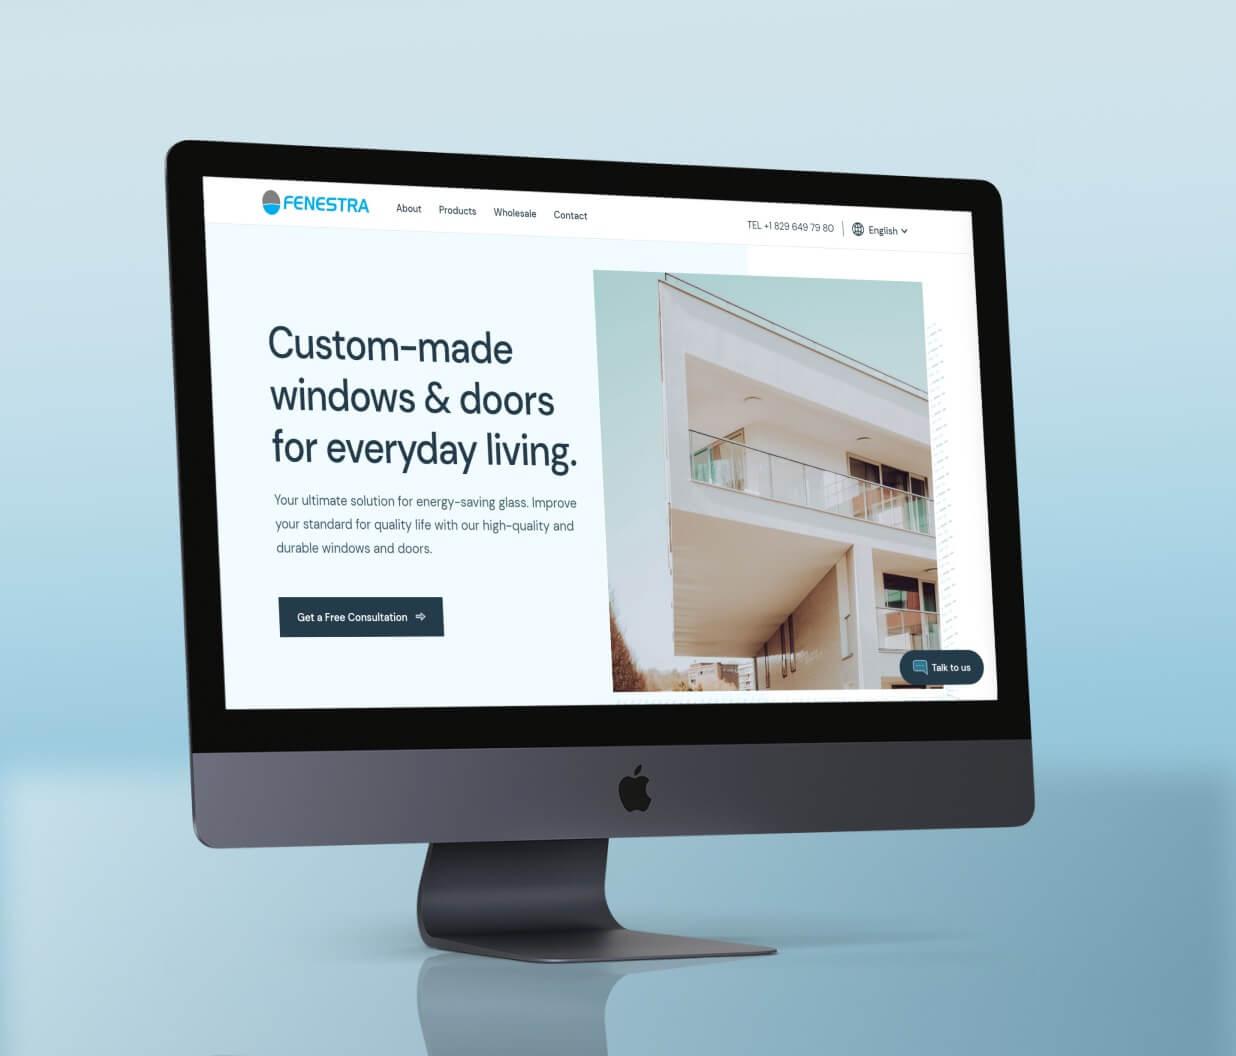 Fenestra website - website homepage, hero section